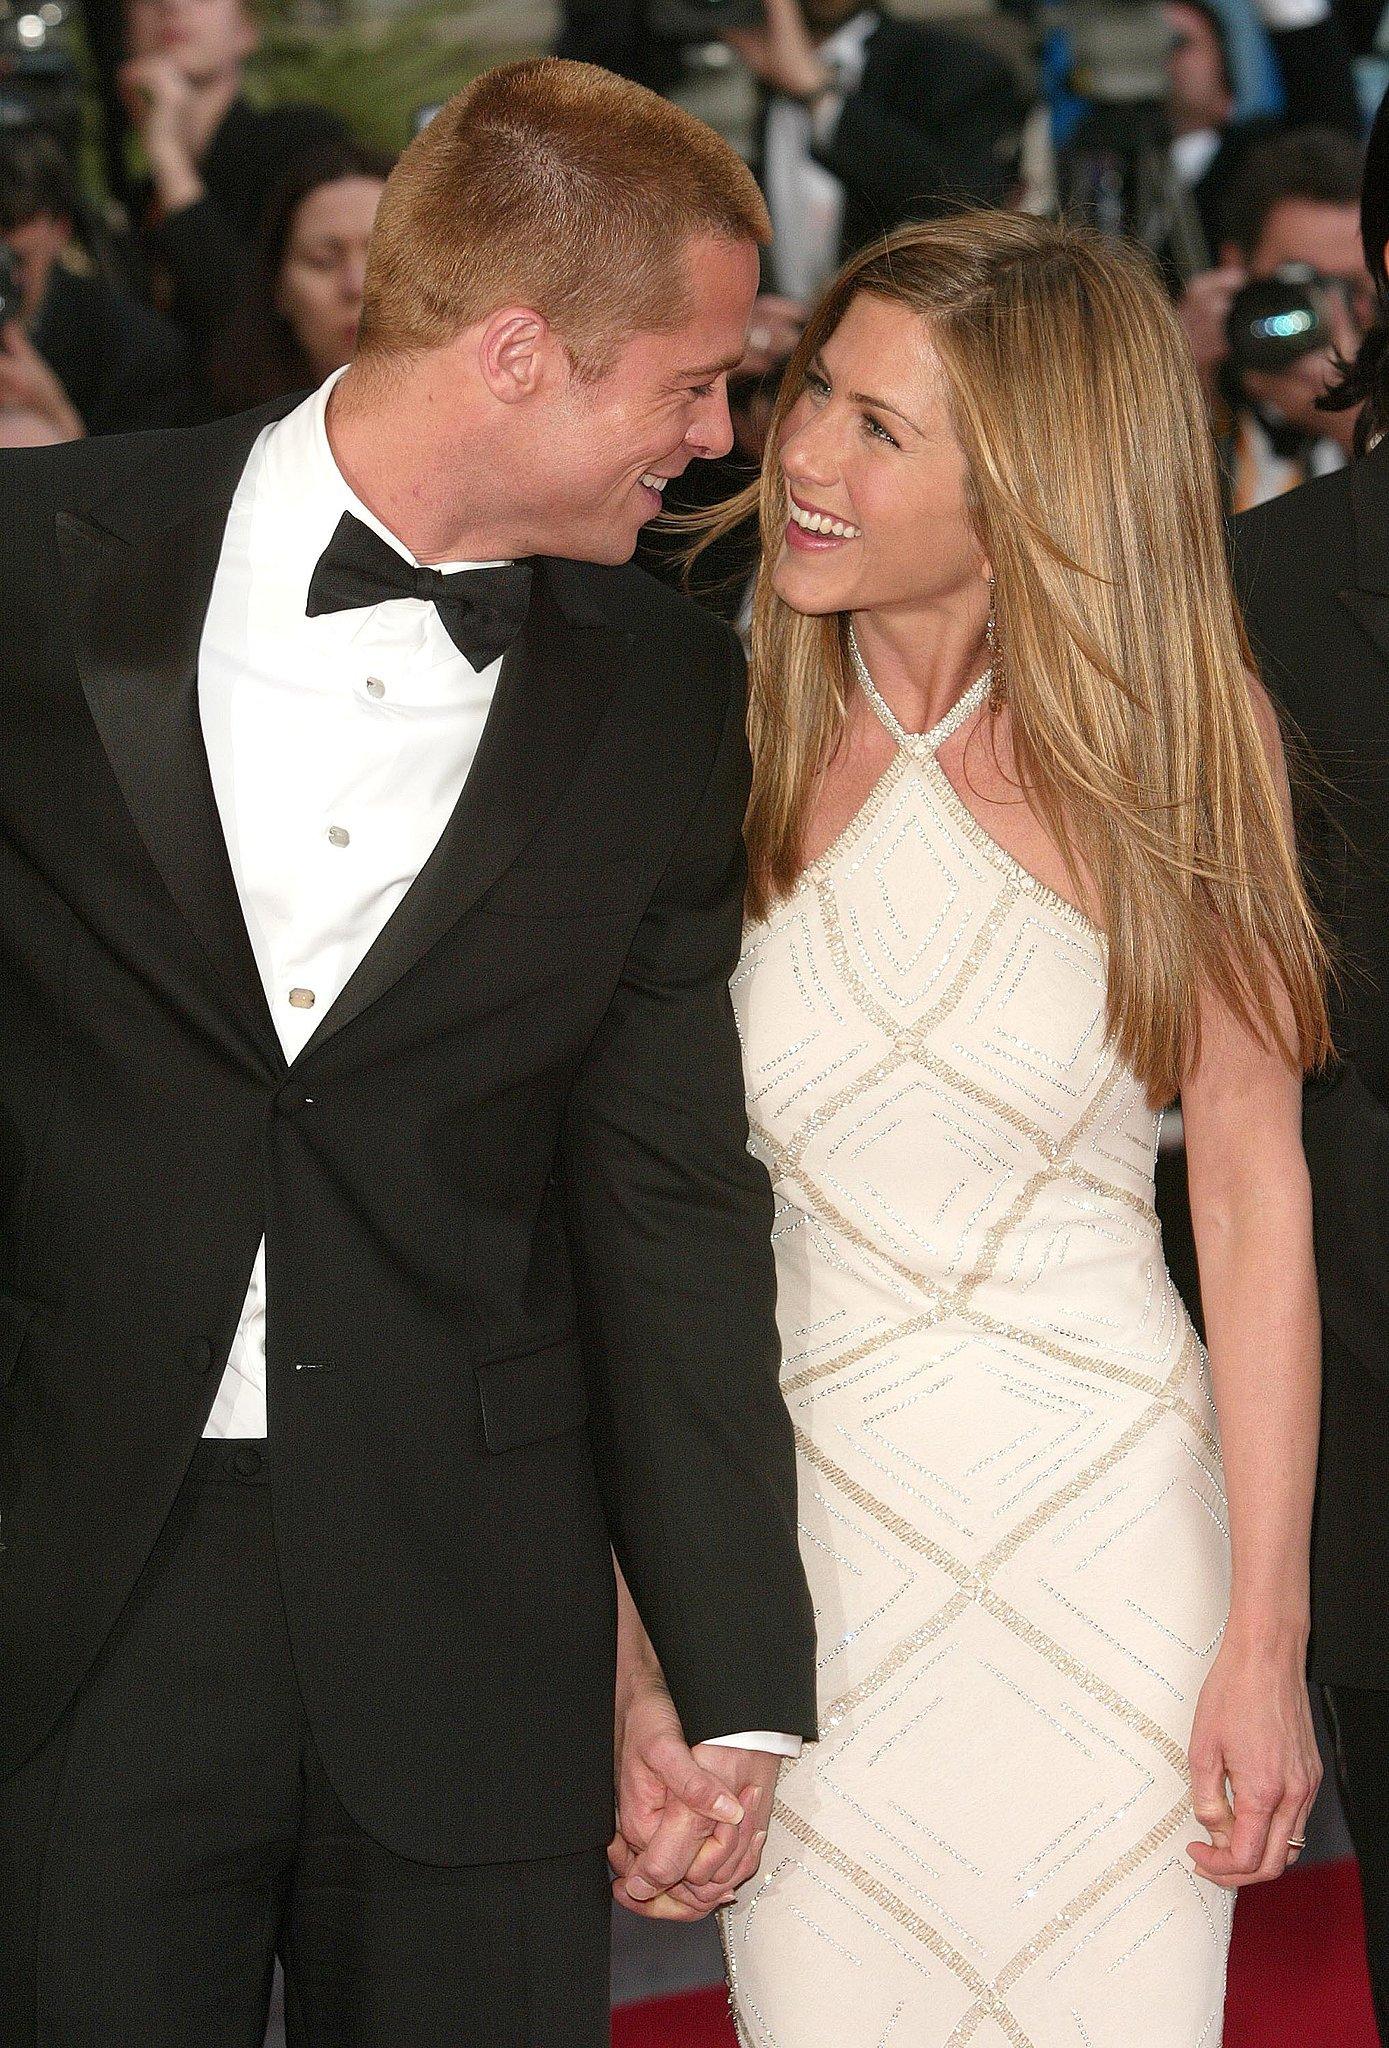 Brad Pitt and Jennifer Aniston were still together.